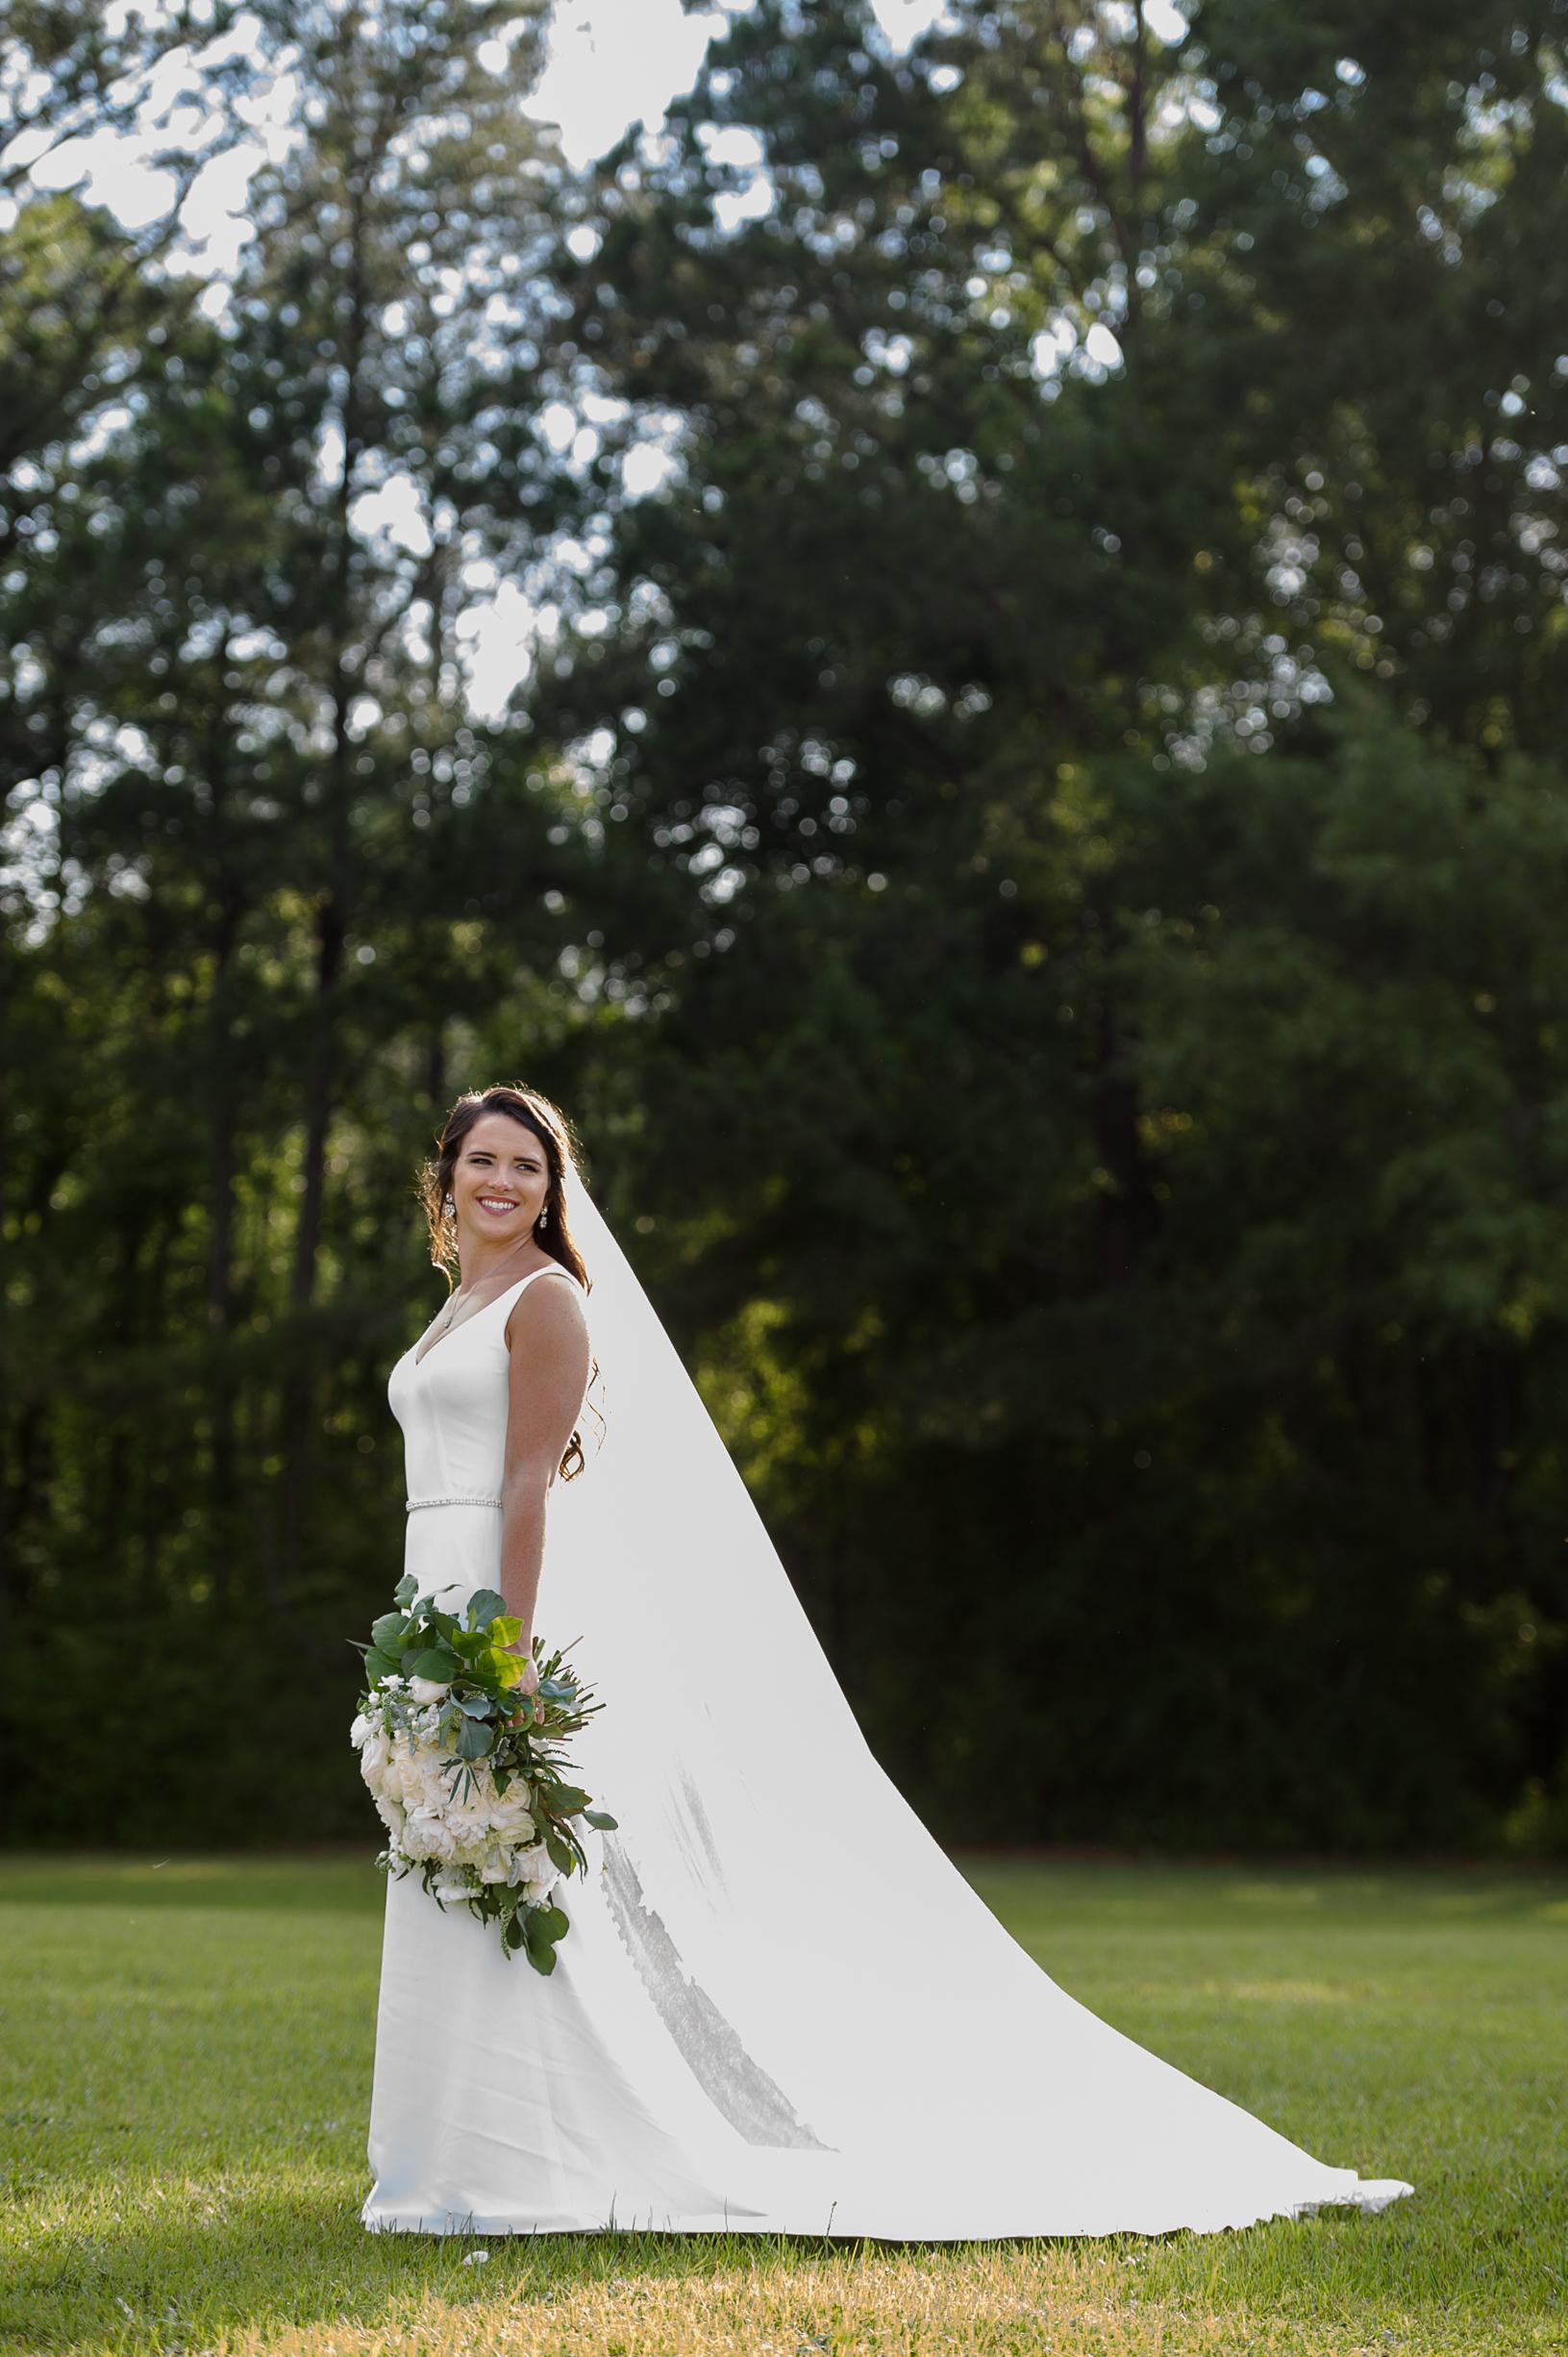 Royal Wedding with Outdoor Reception-41.JPG